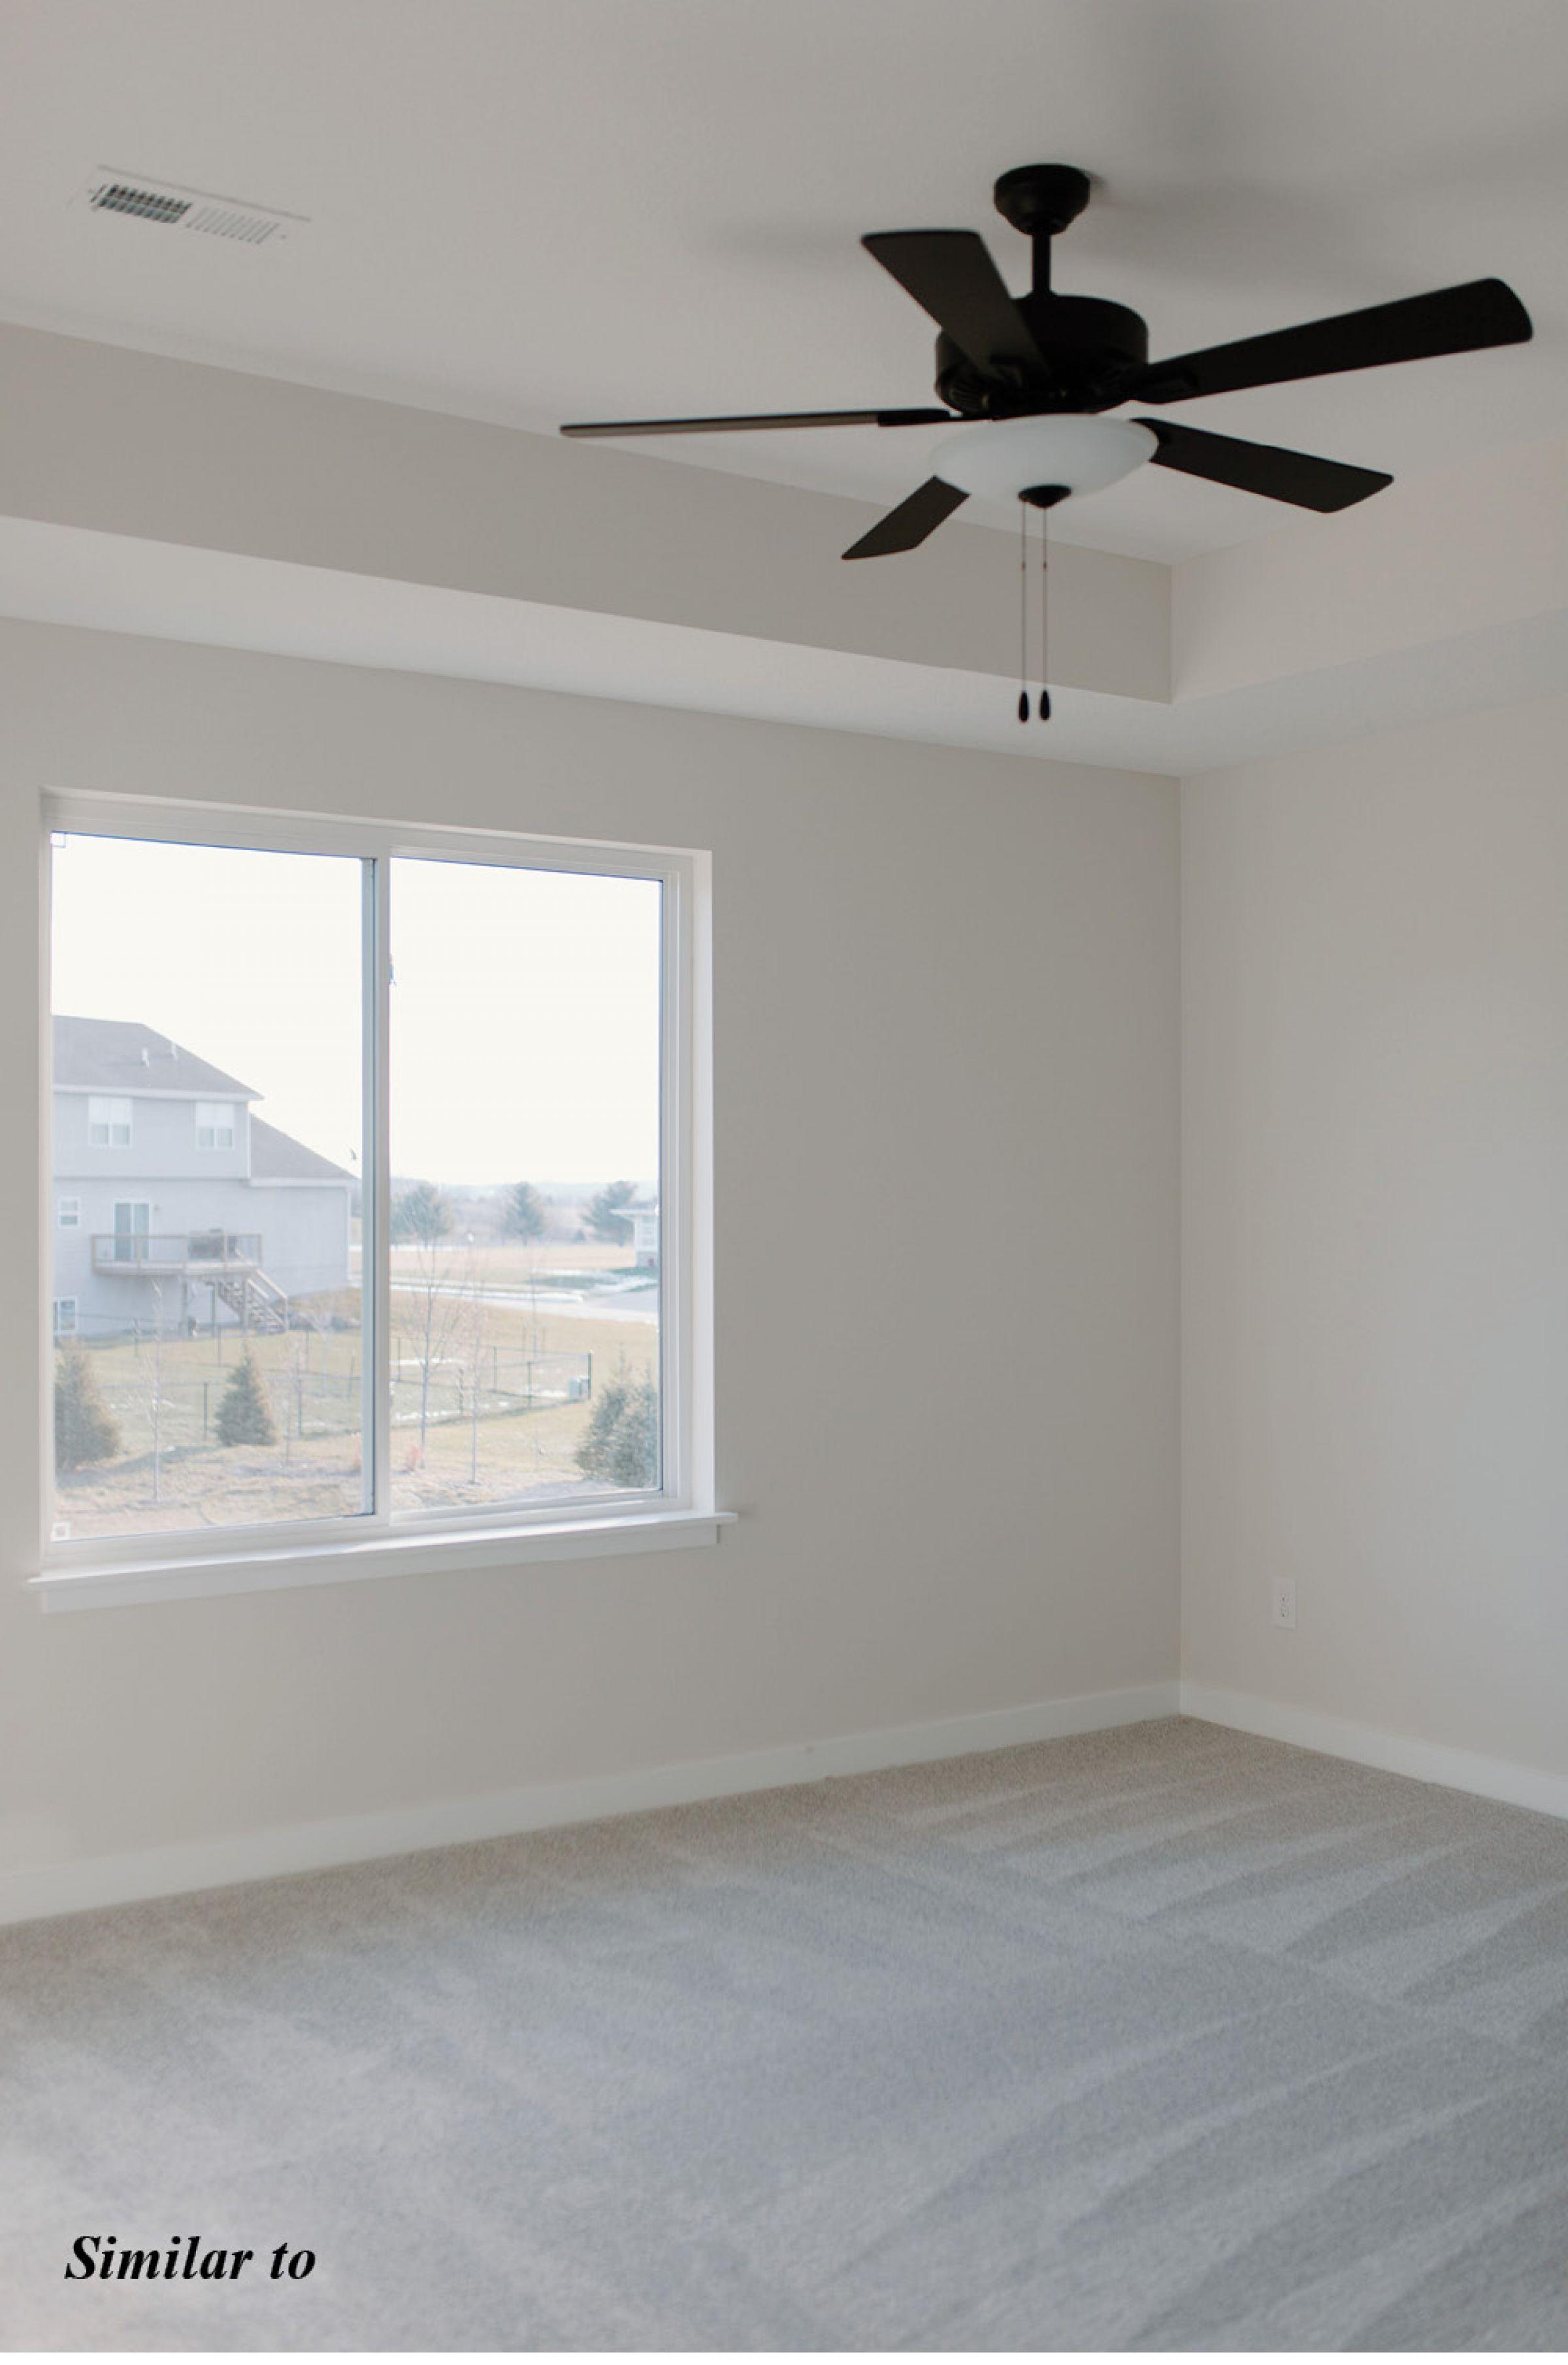 residential-warren-county-iowa-0-acres-listing-number-15676-10-2021-08-06-145020.jpg